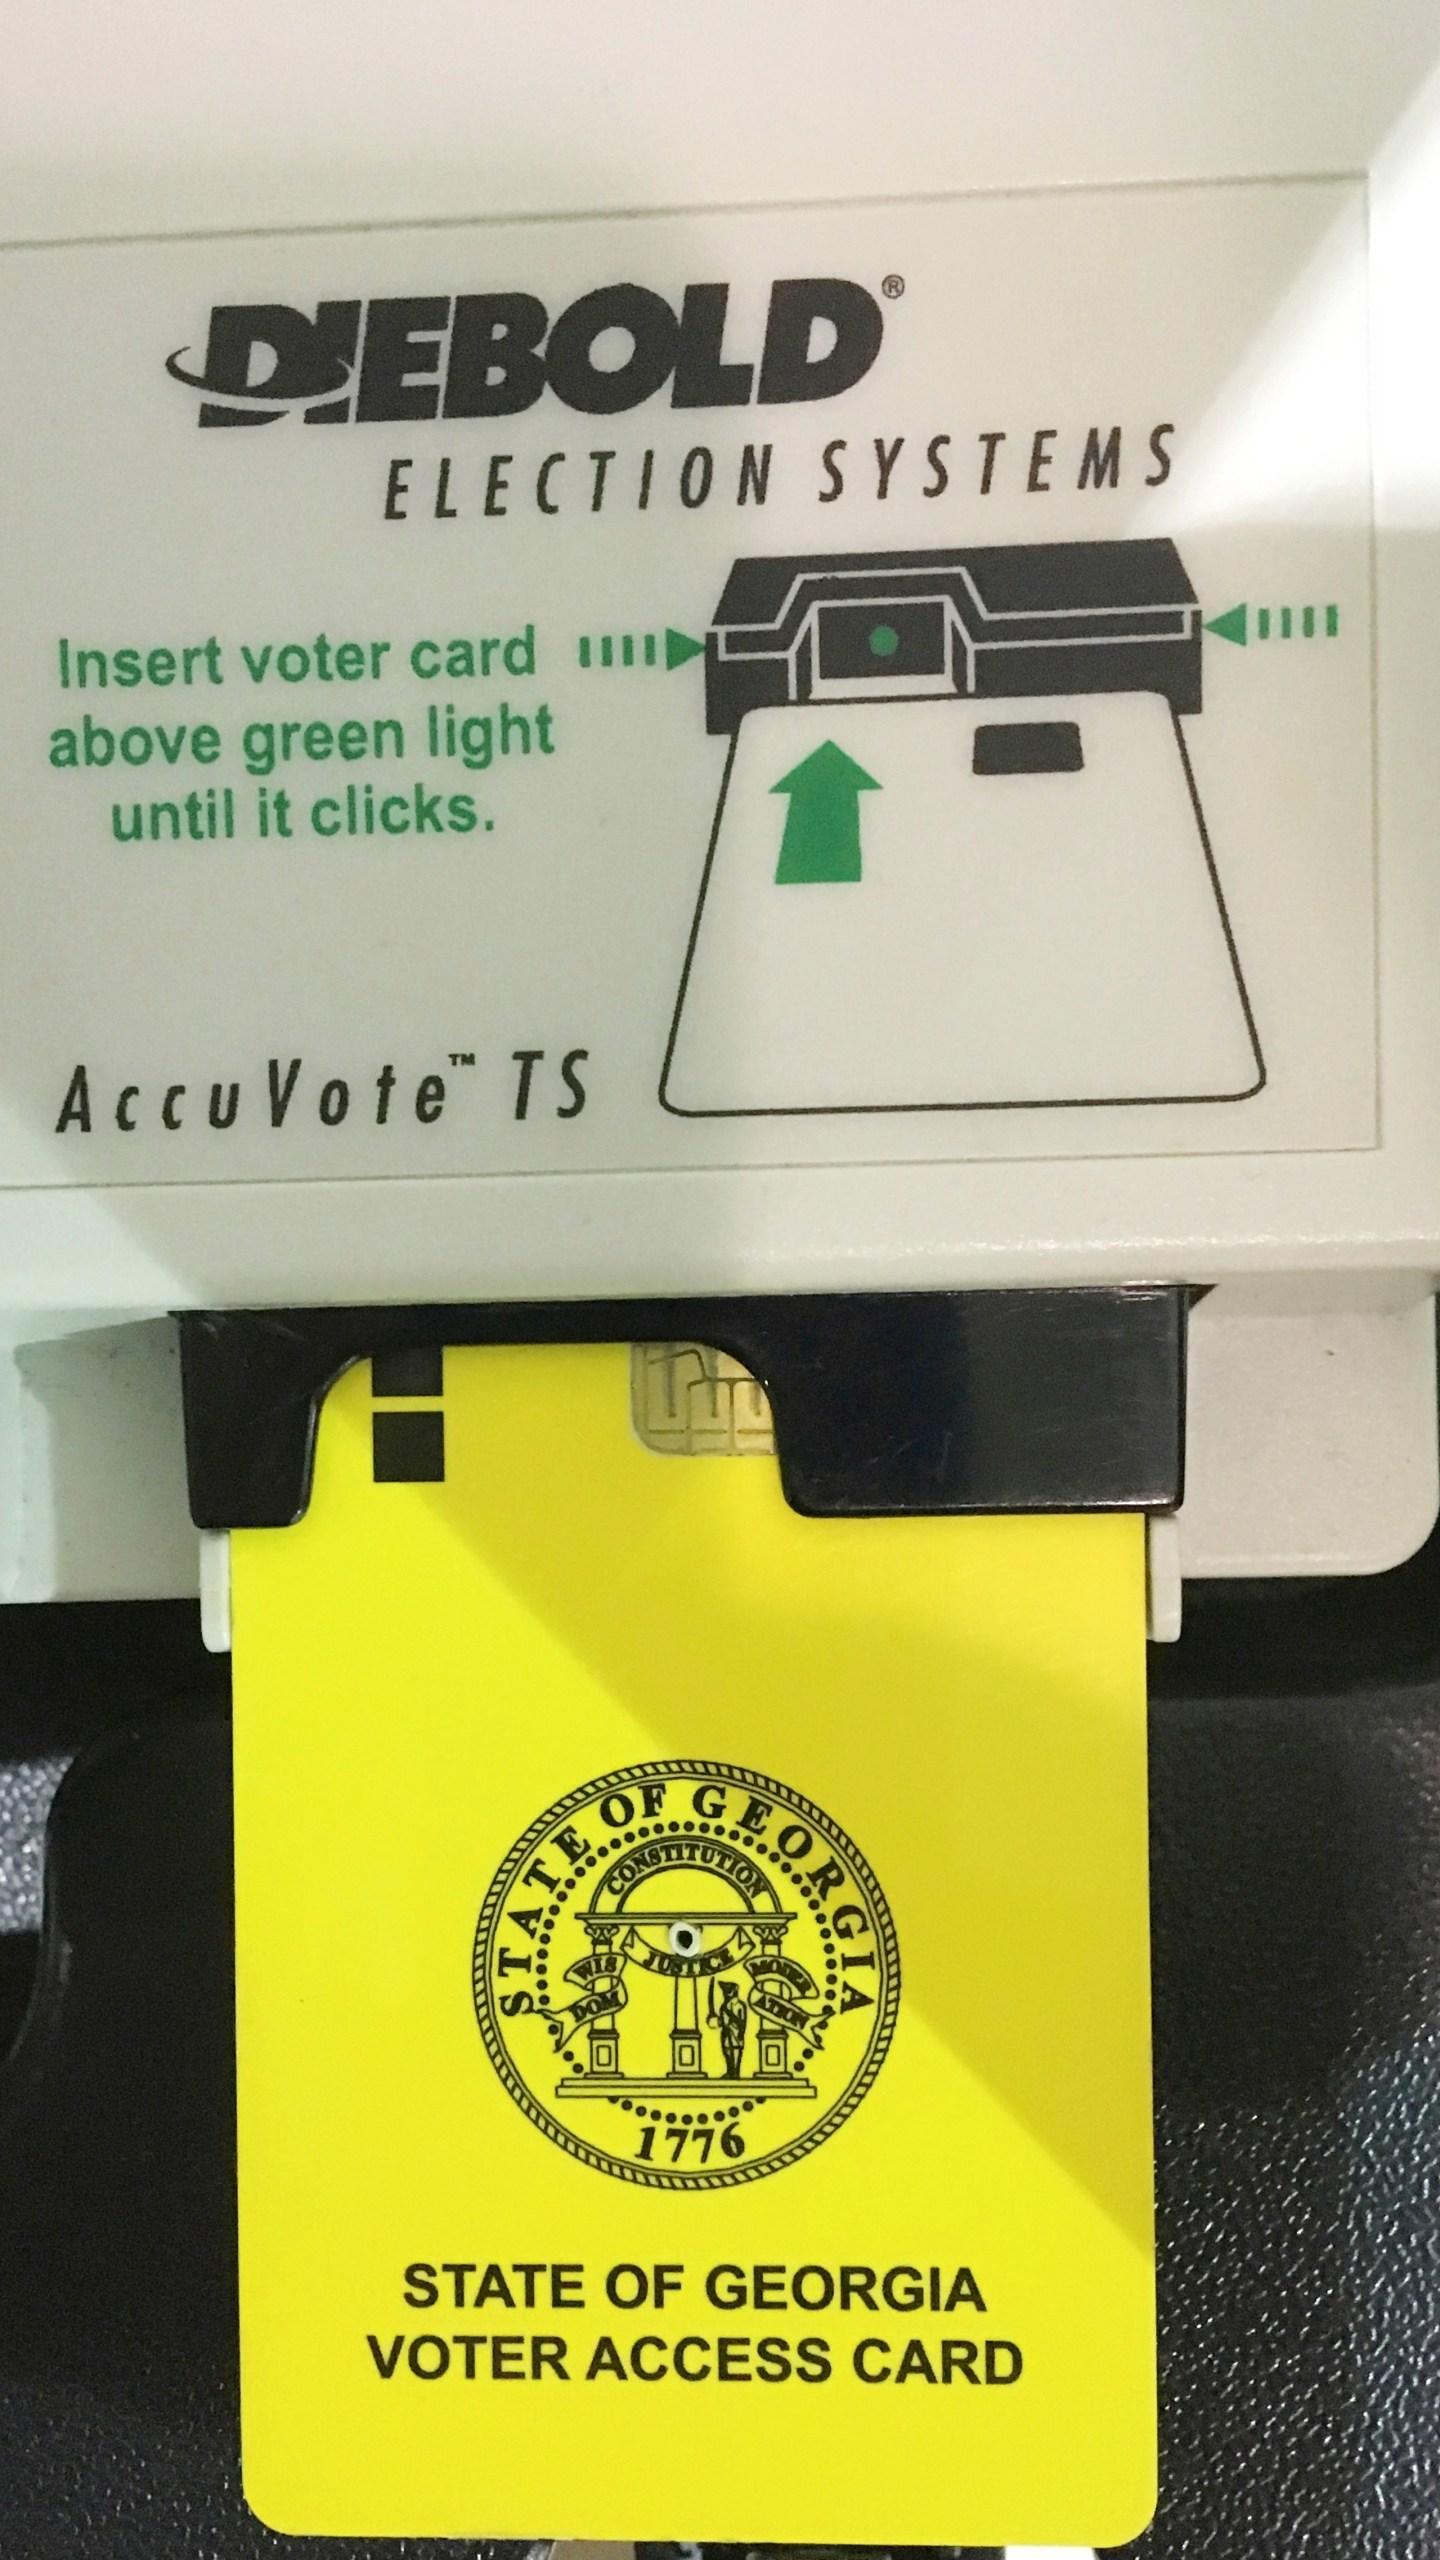 Voting_Machines_Georgia_77956-159532.jpg30122752